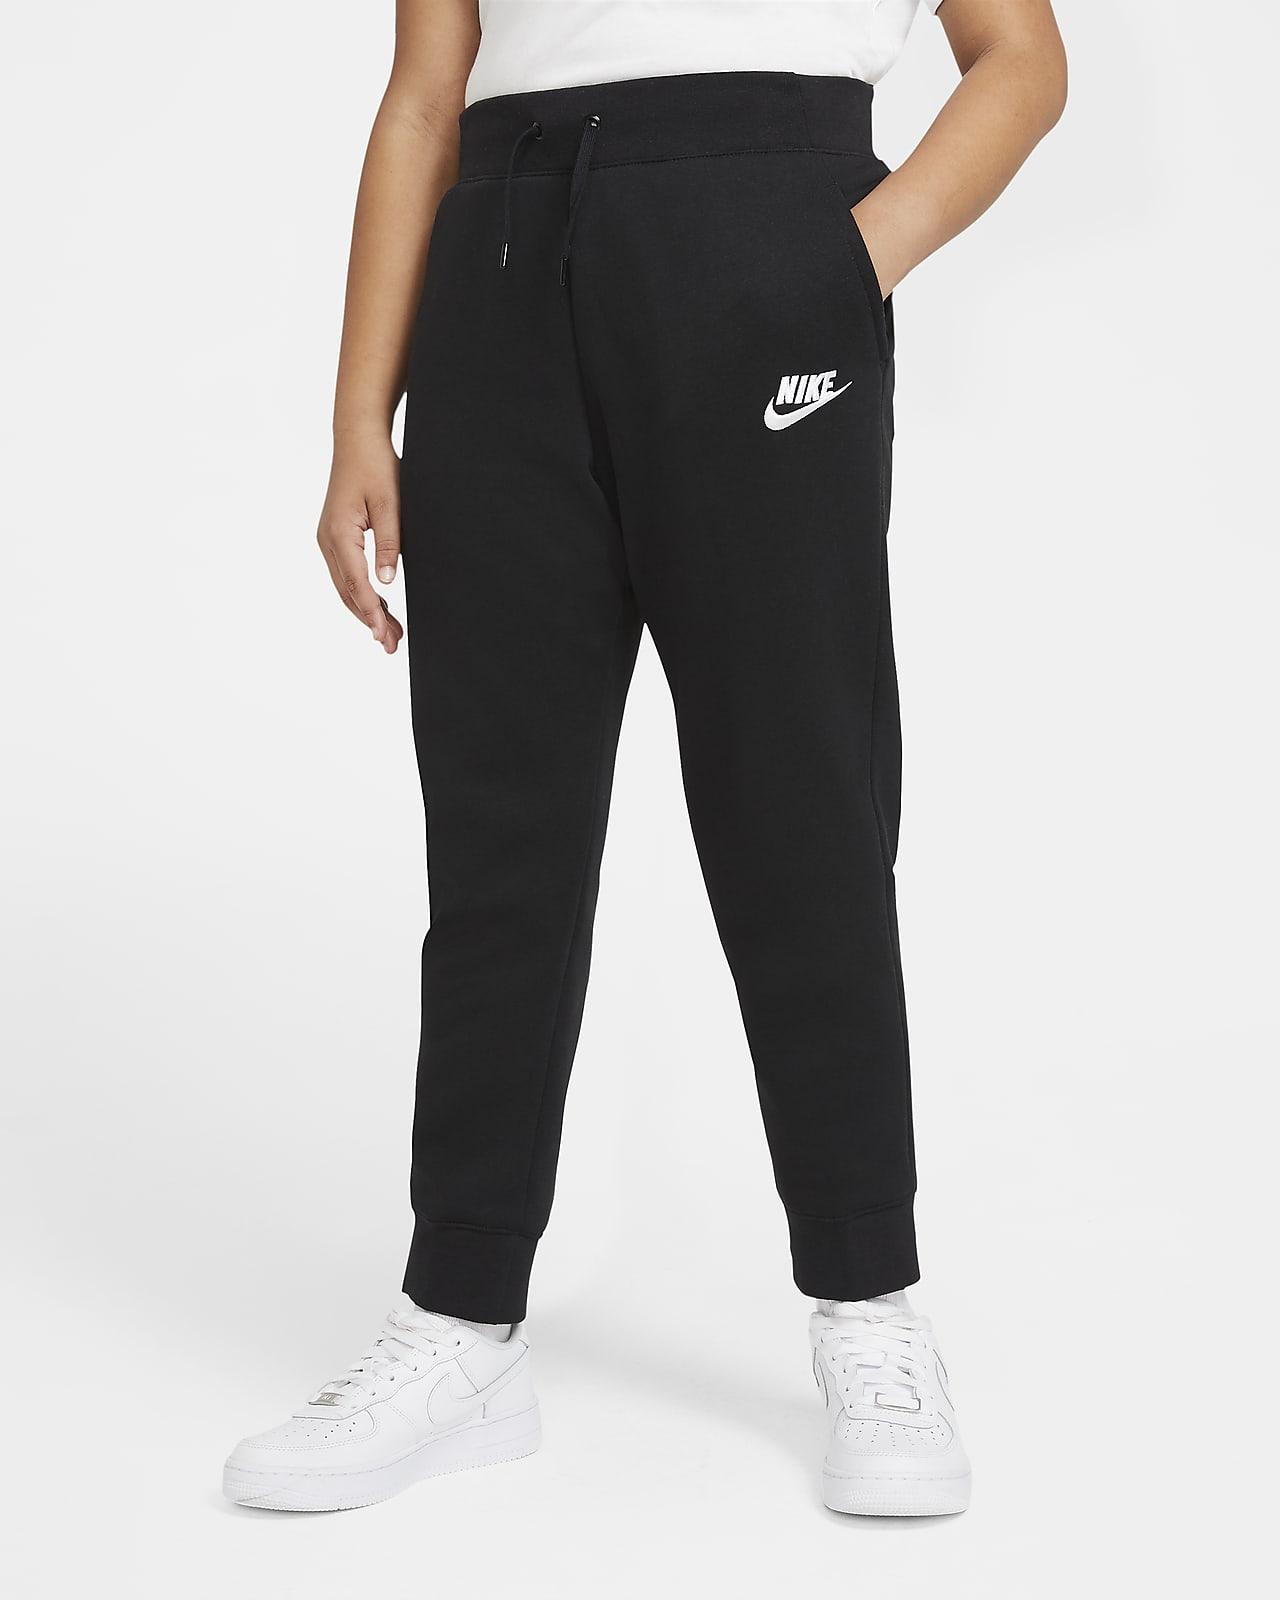 Pantalones para niña talla grande Nike Sportswear (talla extendida)